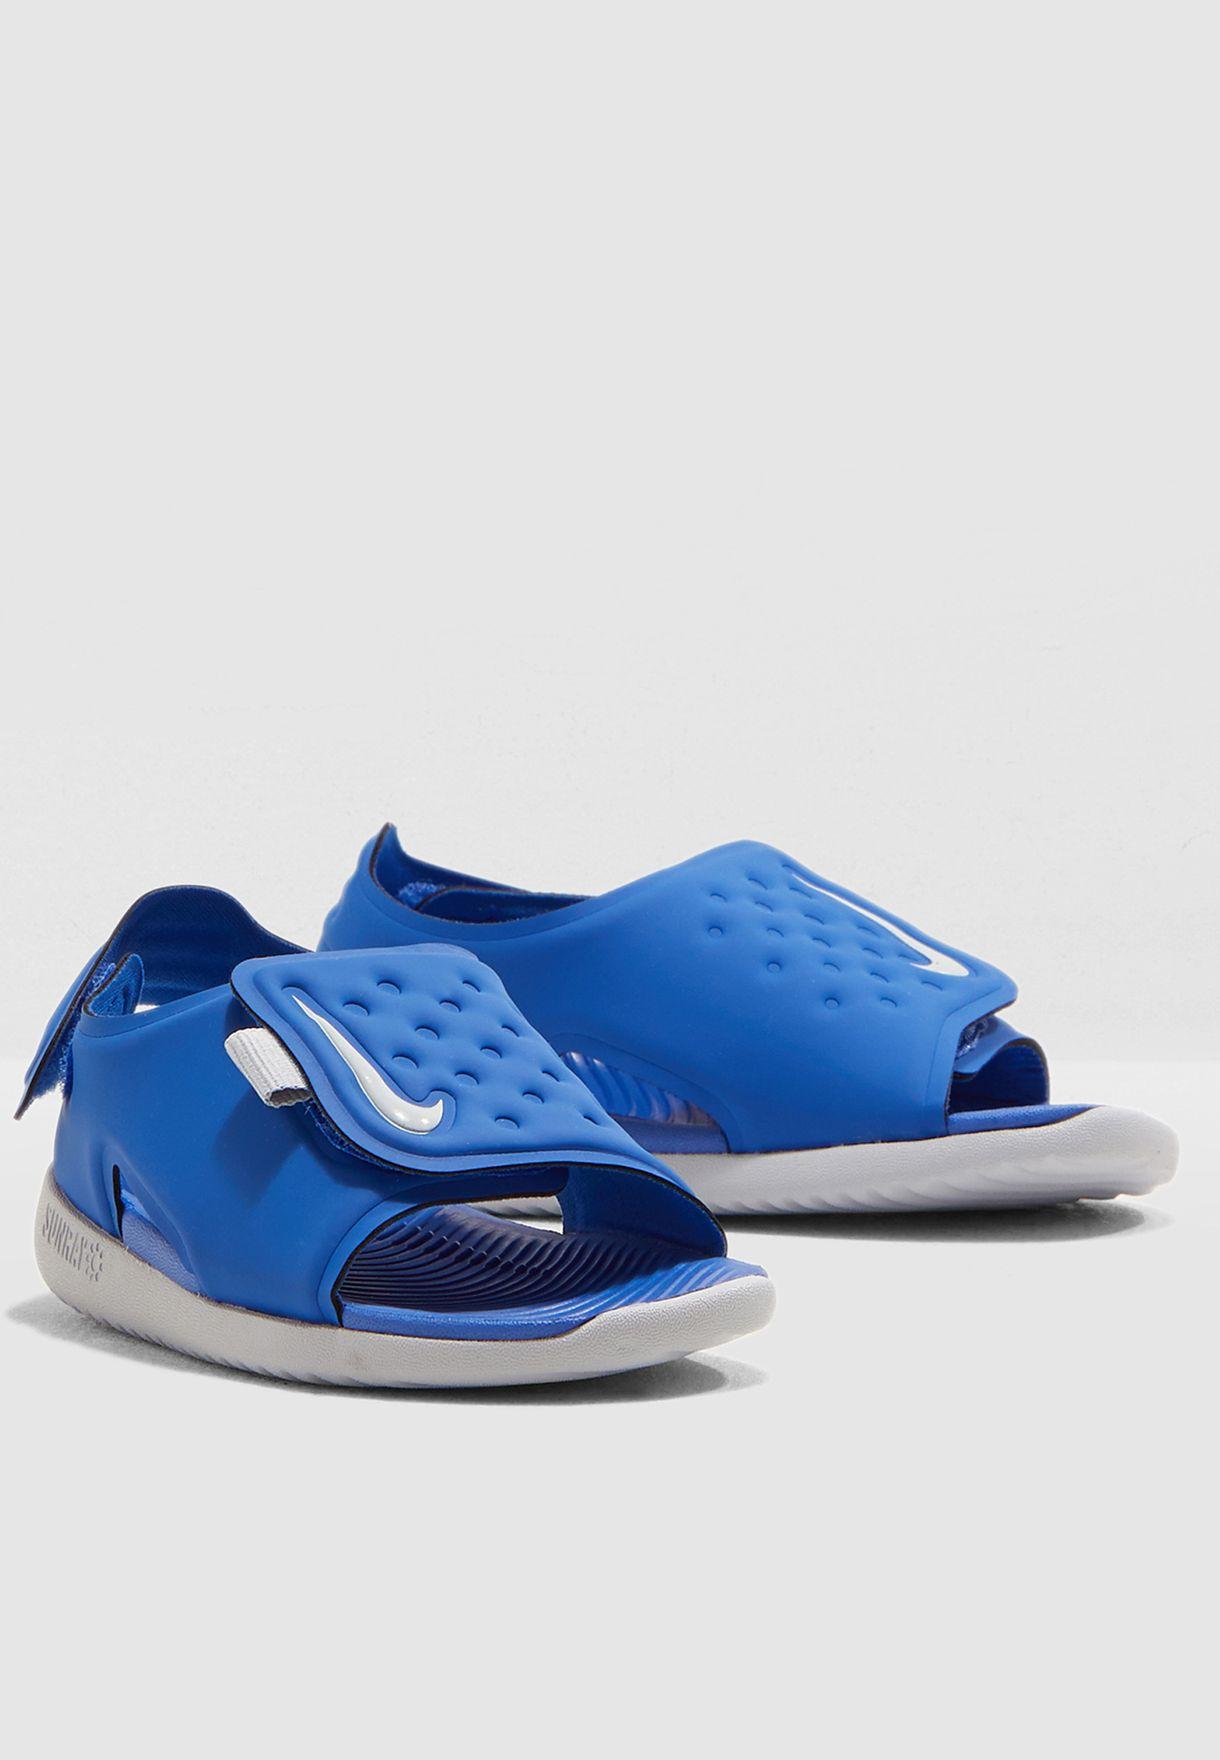 939b6b2d2233 Shop Nike blue Infant Sunray Adjust 5 AJ9077-400 for Kids in UAE ...